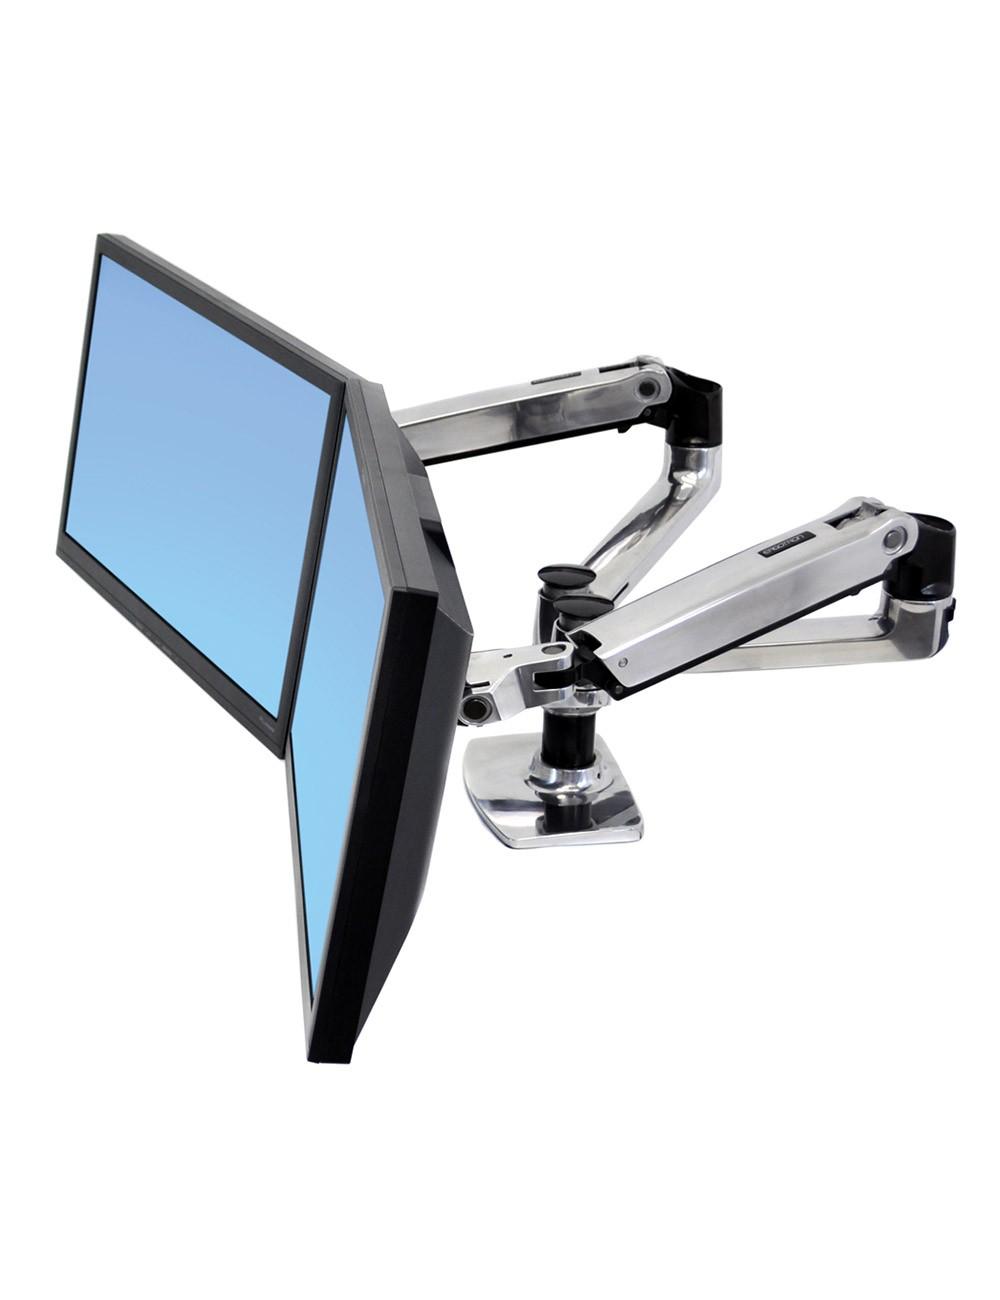 Ergotron Lx Dual Desk Mount Arm Create A Fully Adjustable